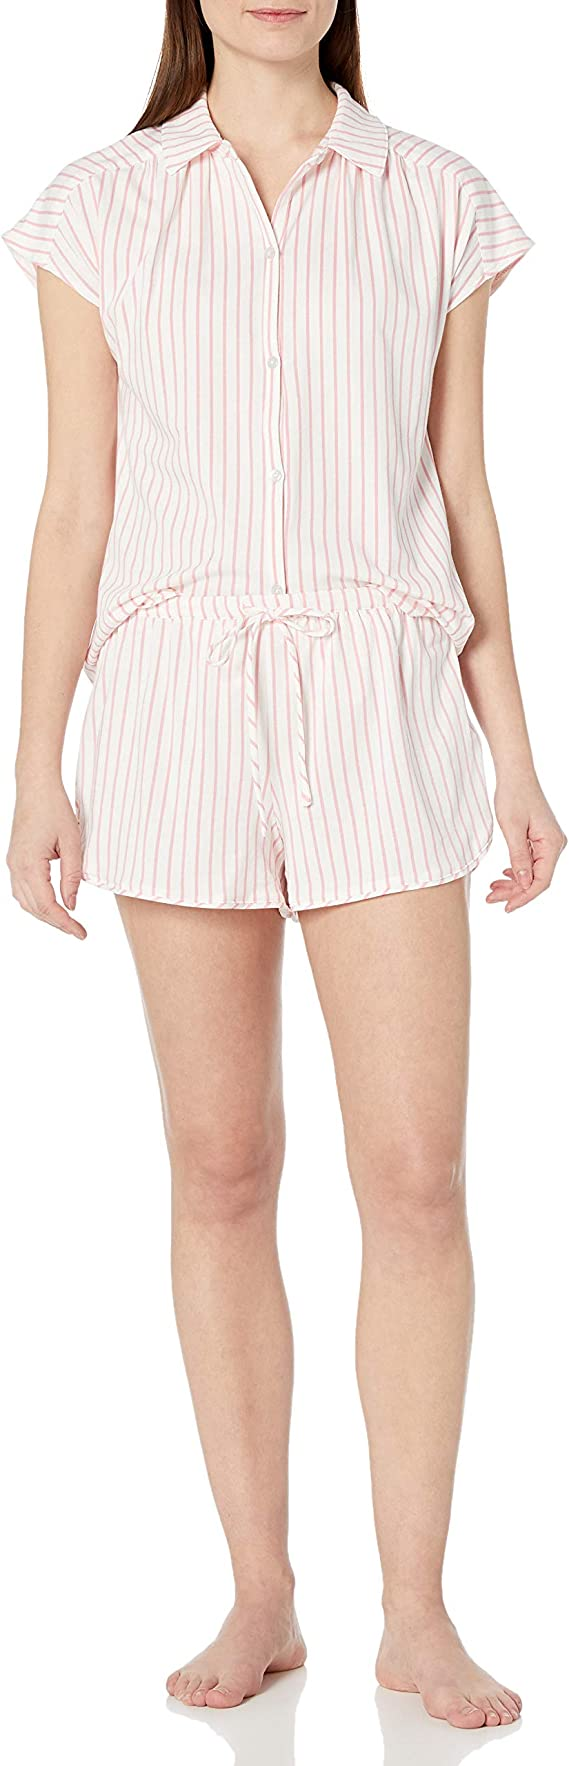 Jane and Bleecker Women/'s Notch Collar Button Front Capri Pant PJ Set 1394818